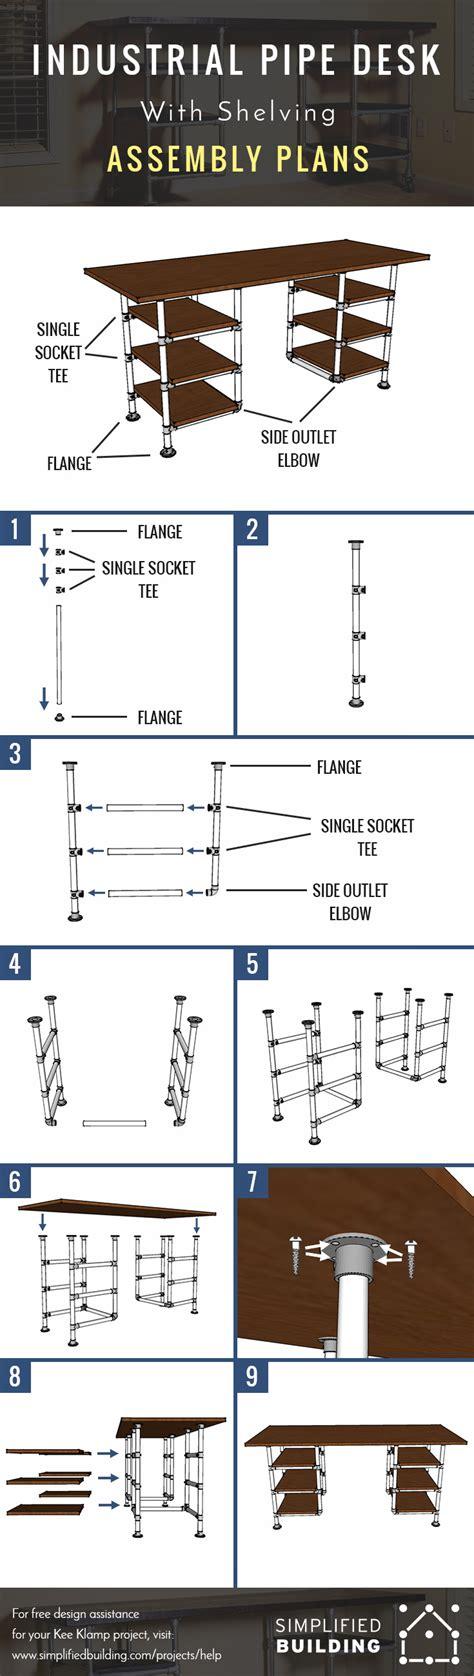 industrial pipe desk shelving plans